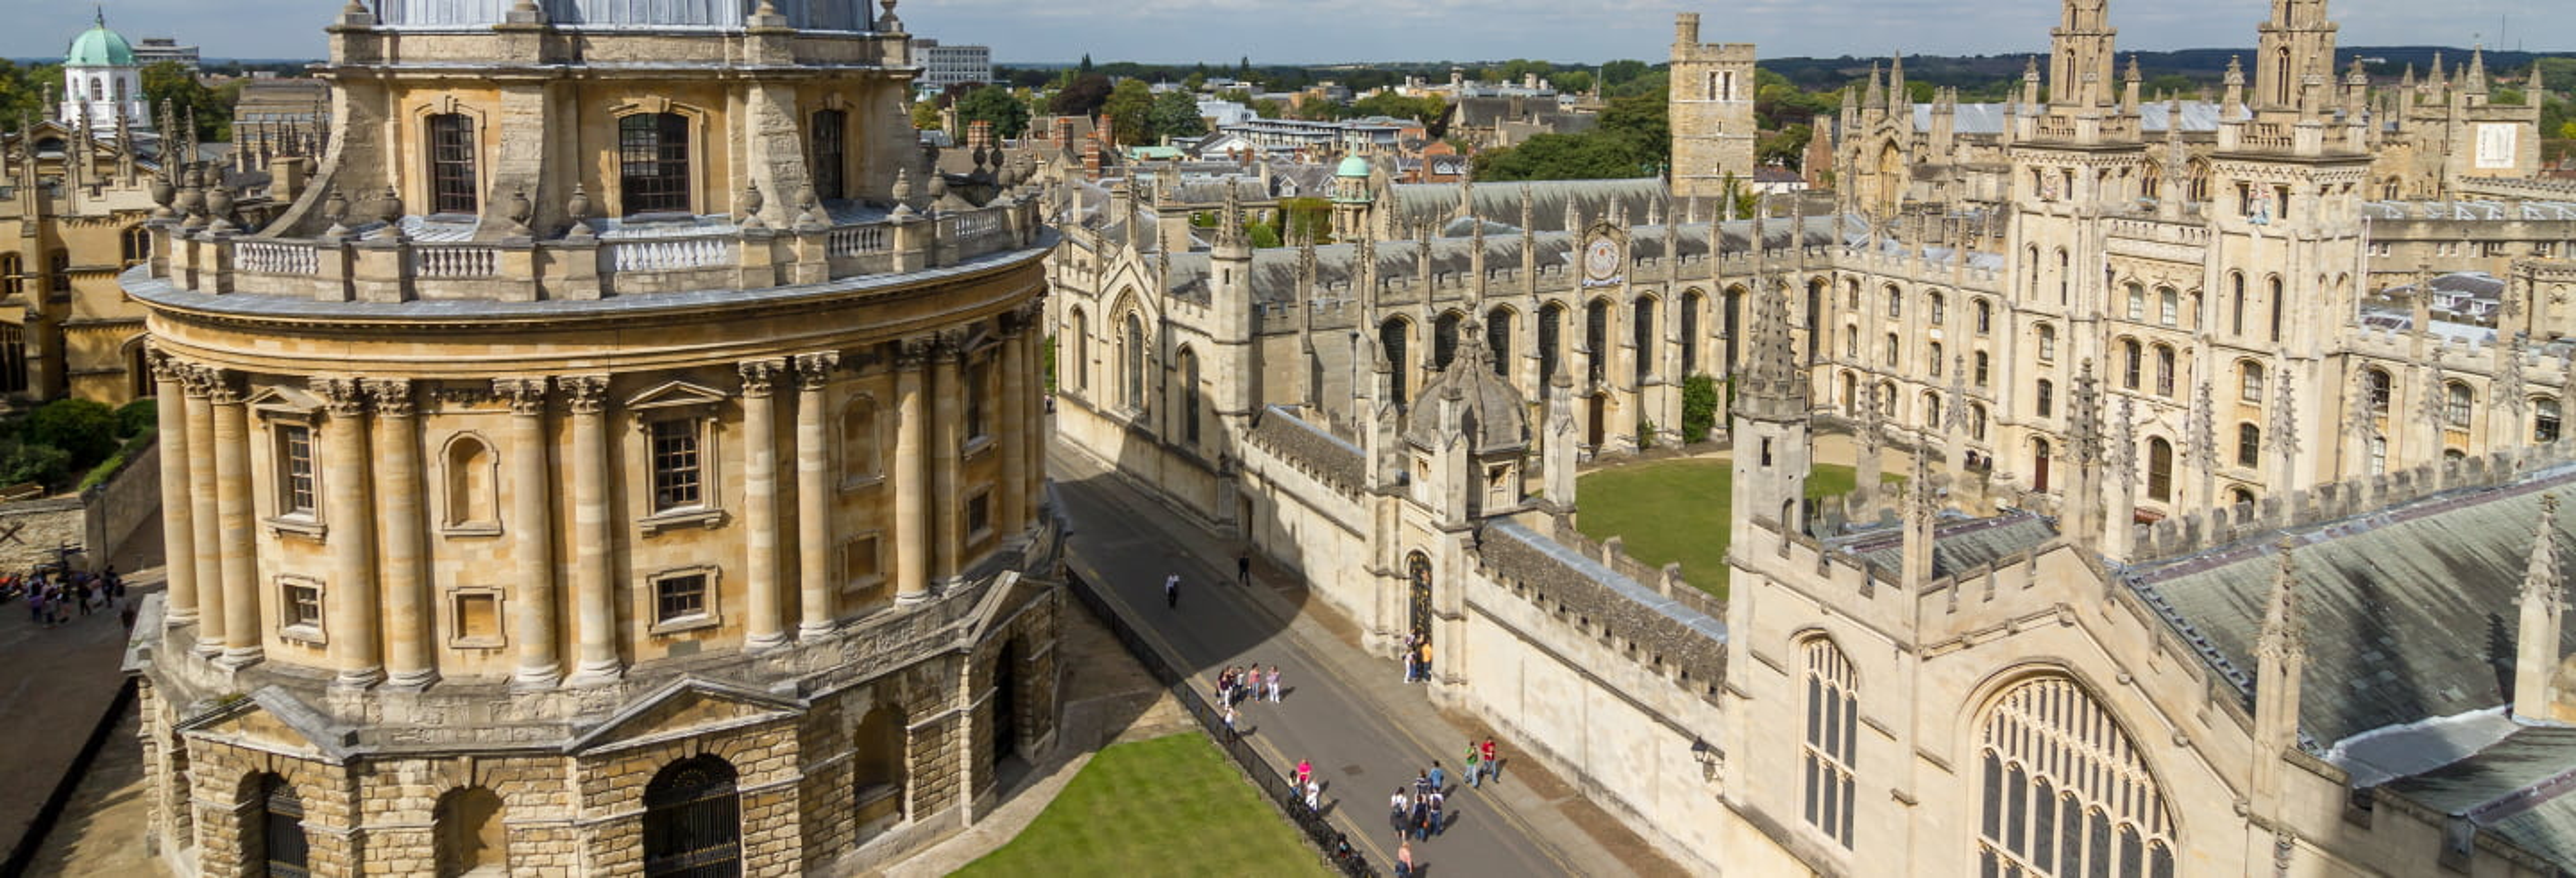 Visita guiada por Oxford